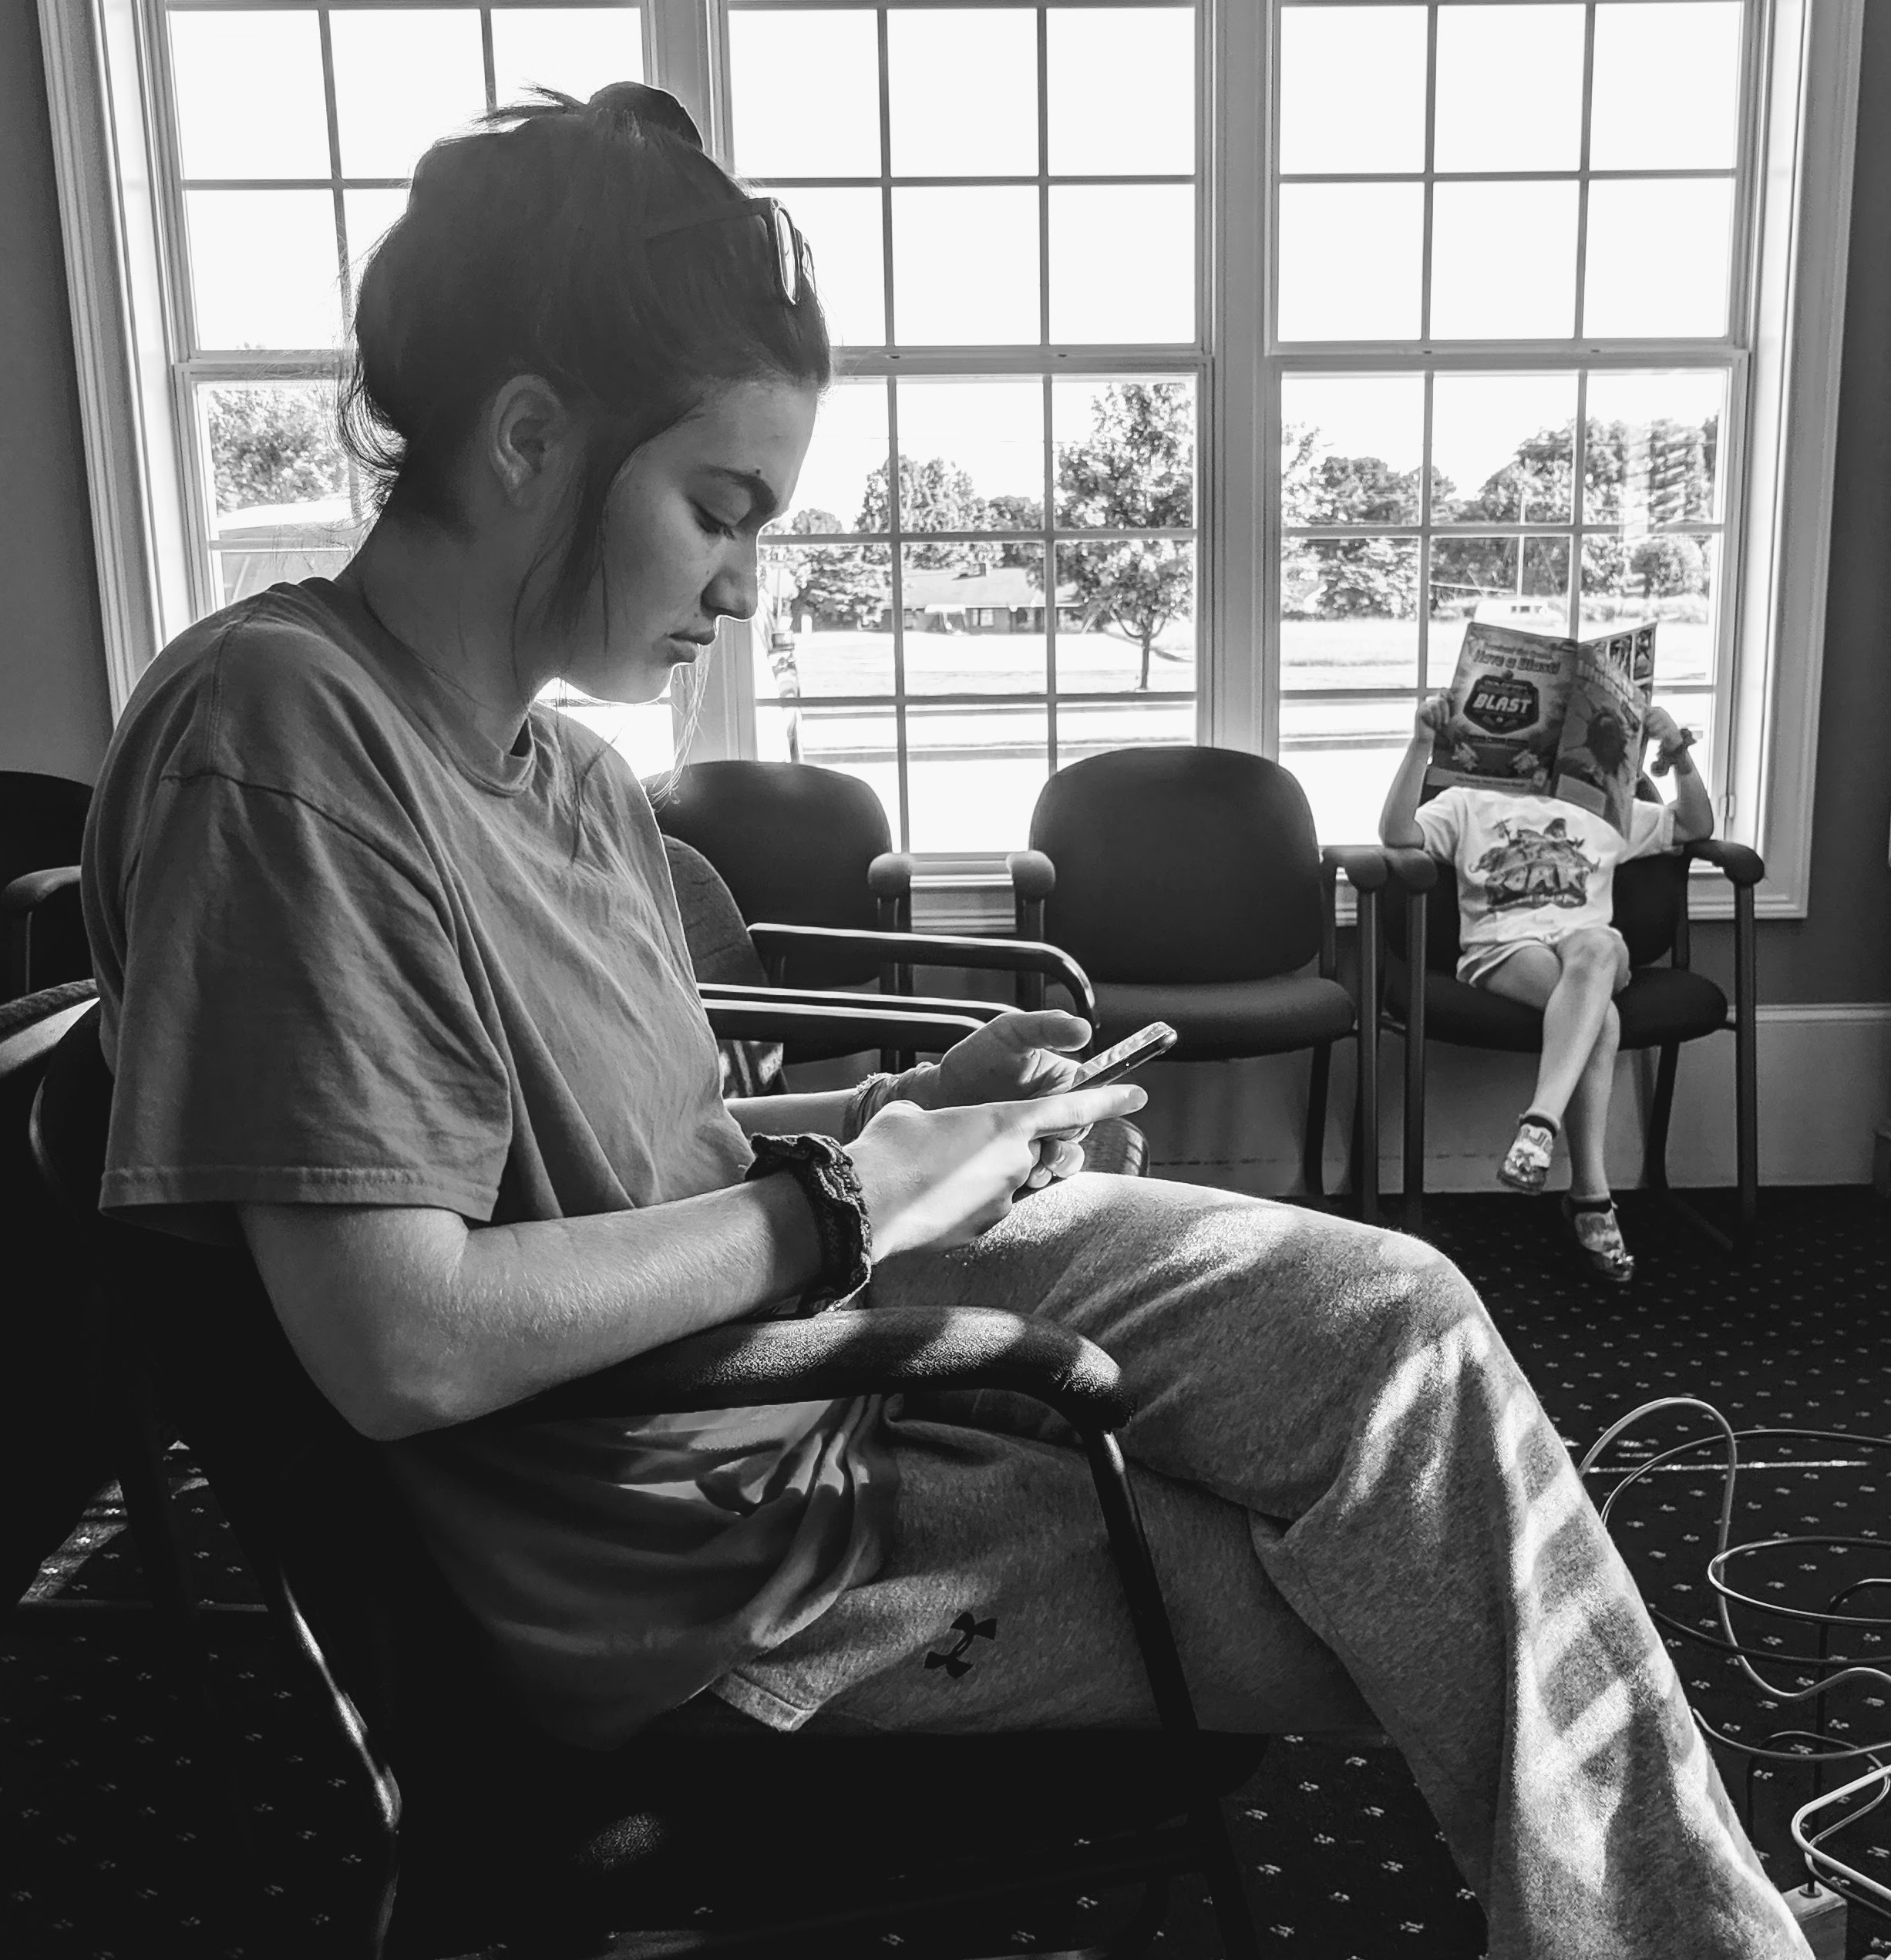 Teen sitting in chair